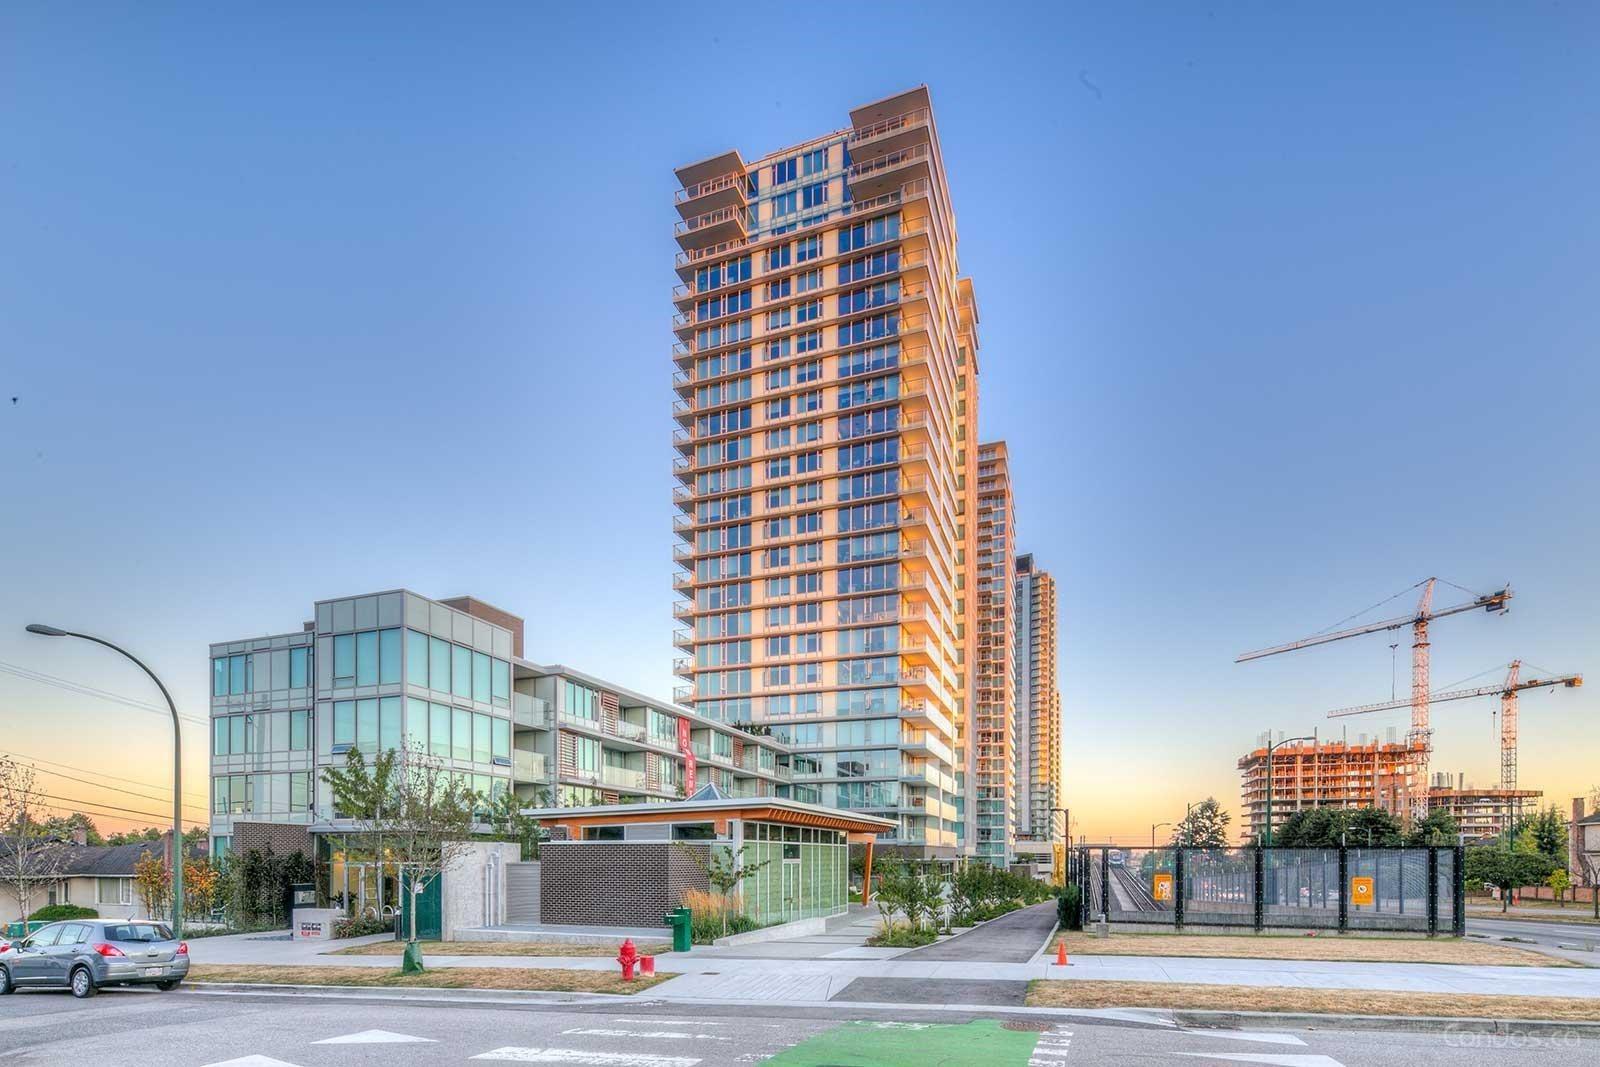 802 8131 NUNAVIT LANE - Marpole Apartment/Condo for sale, 2 Bedrooms (R2626238)